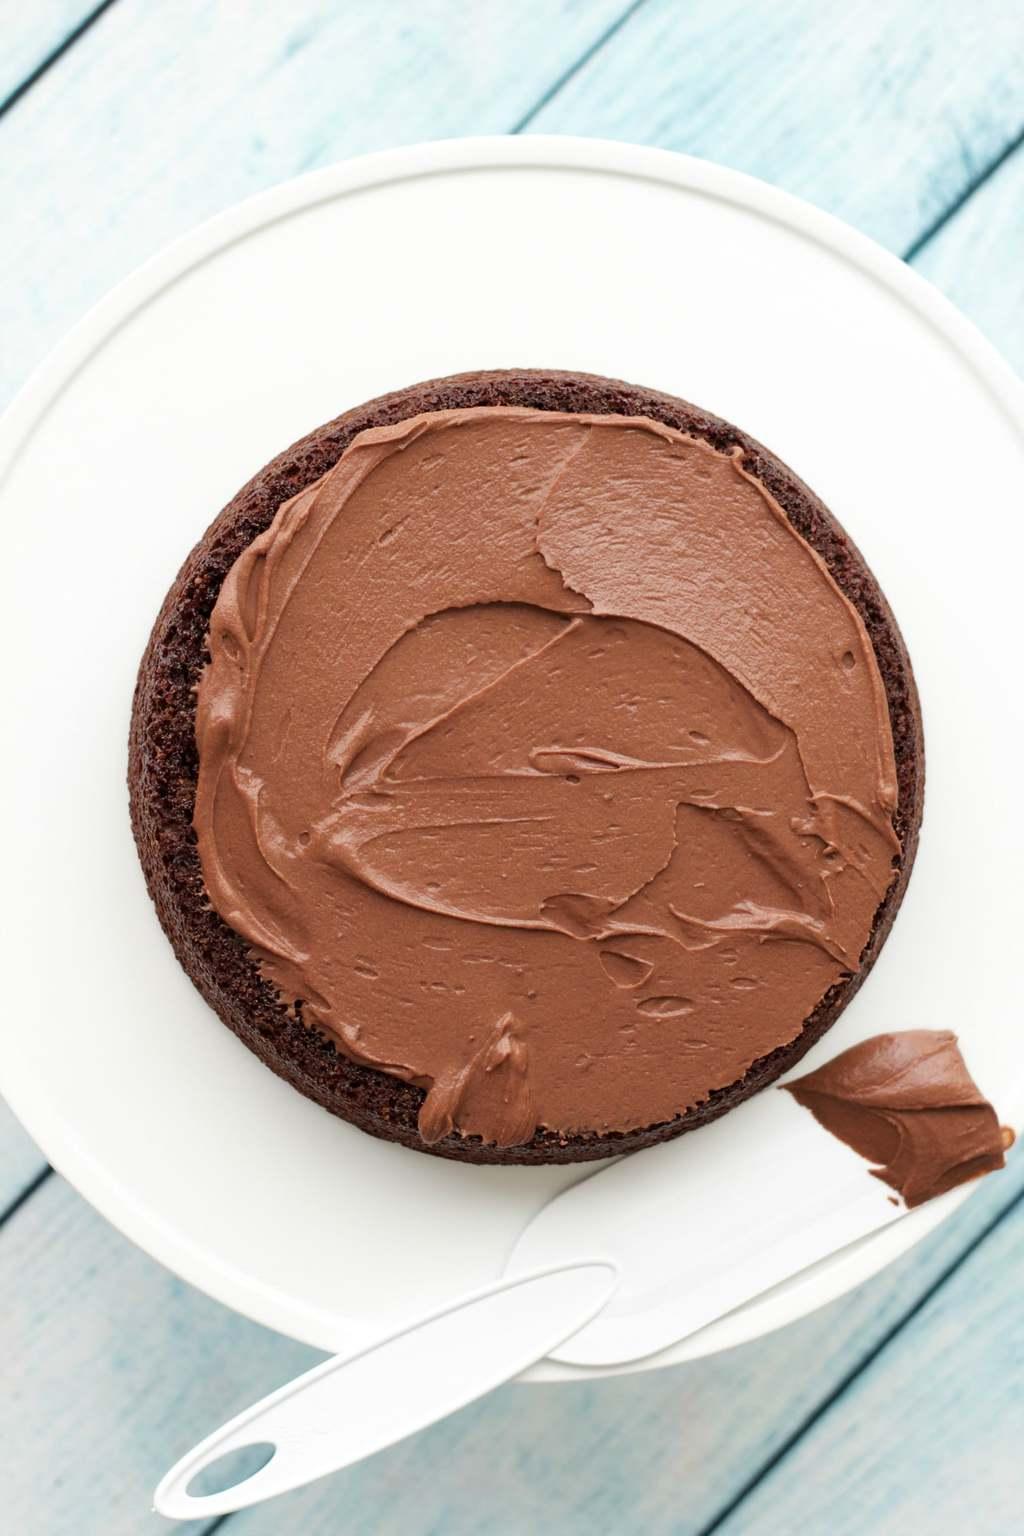 Vegan Chocolate Ganache Frosting - Ideal for cakes, cupcakes or cookies! #vegan #lovingitvegan #glutenfree #dairyfree #dessert